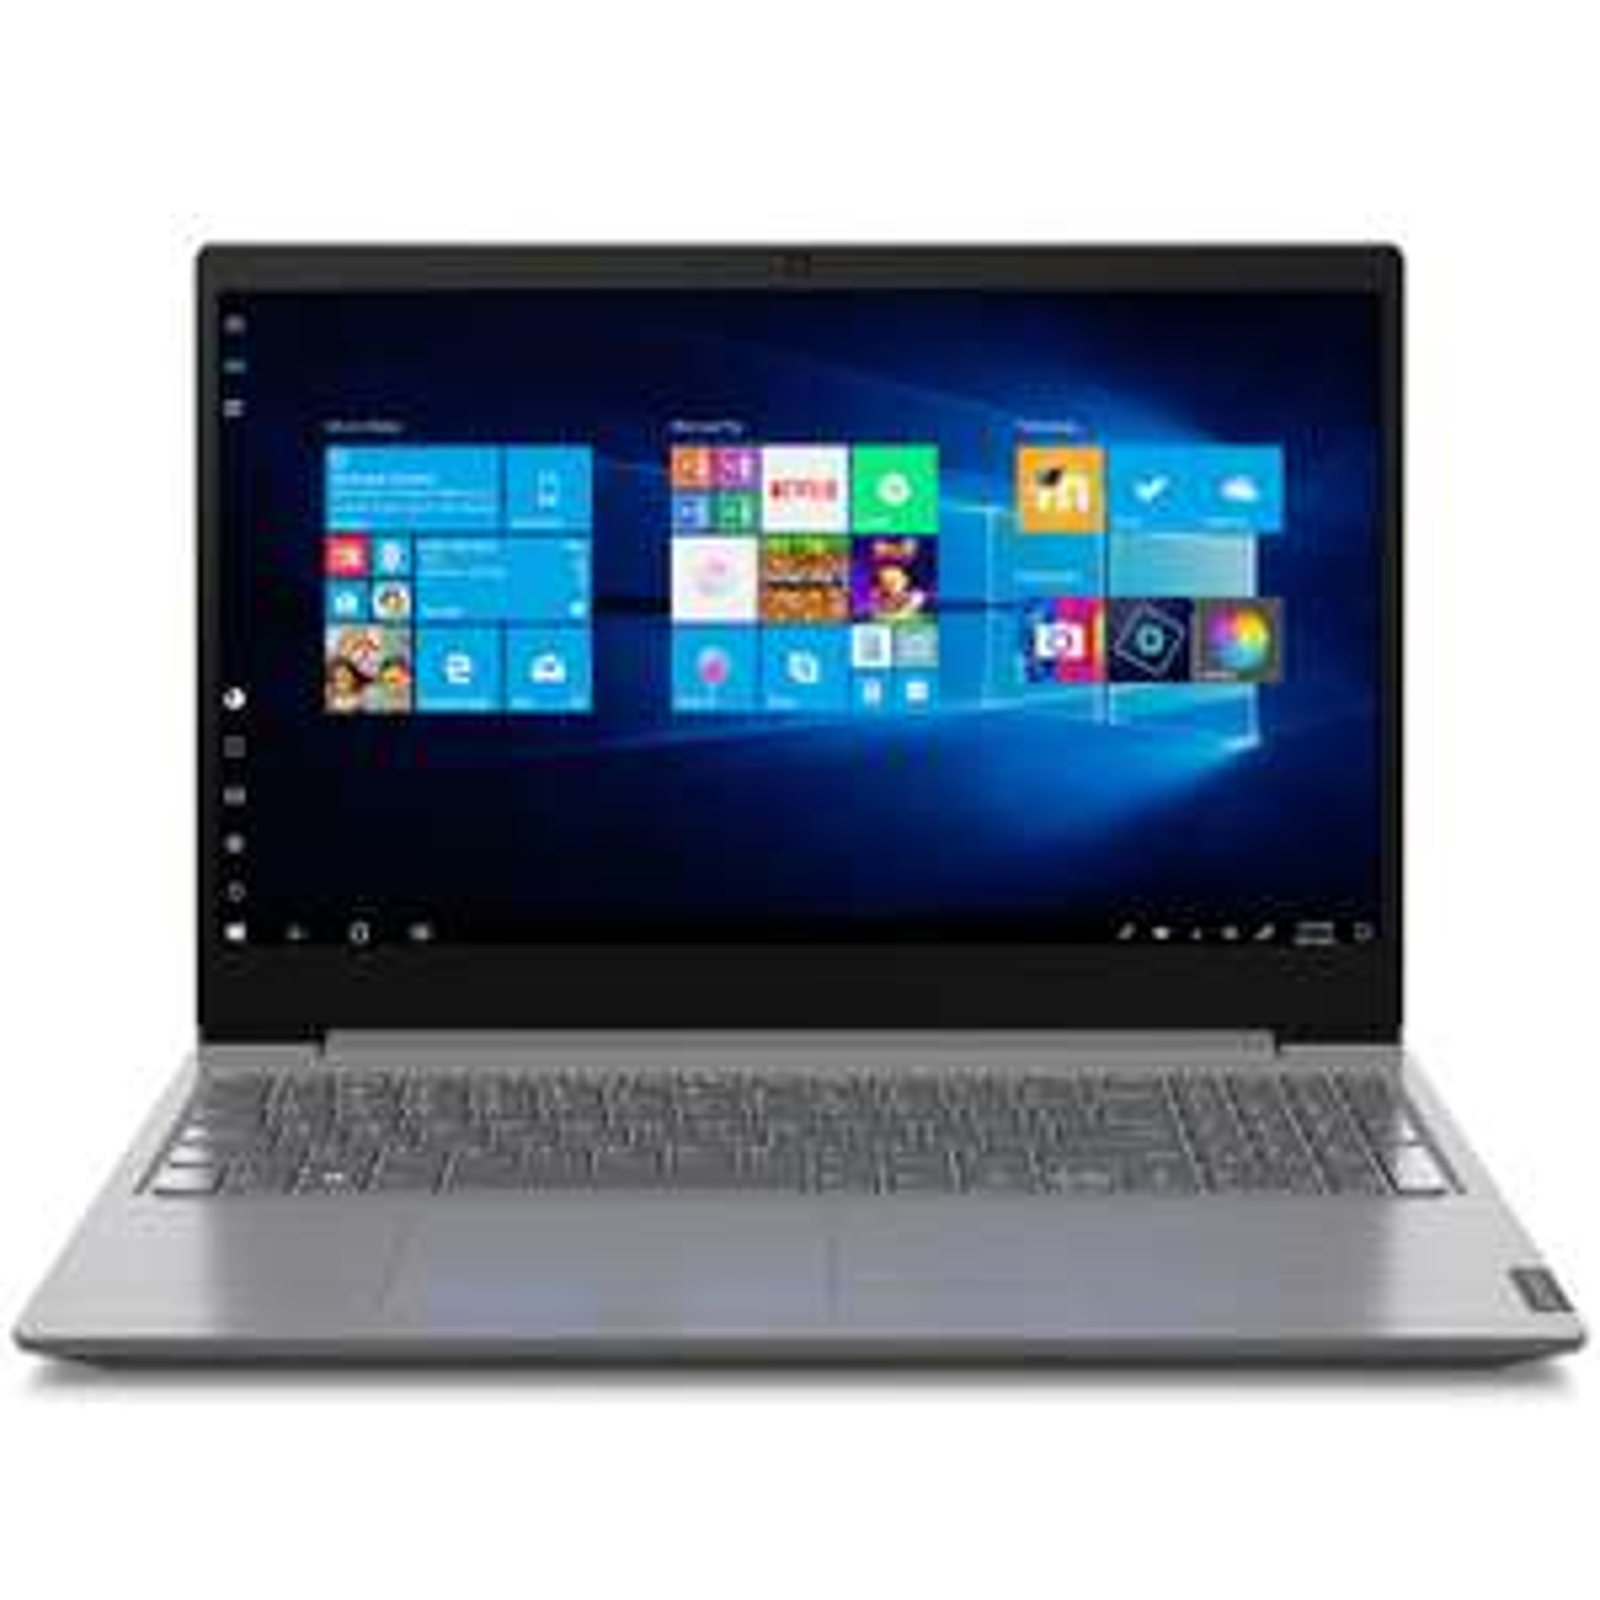 "PC Portable 15.6"" Lenovo V15-IIL - i3-1005G1, 4Go, 256Go SSD, QWERTZ (Frontaliers Suisse)"